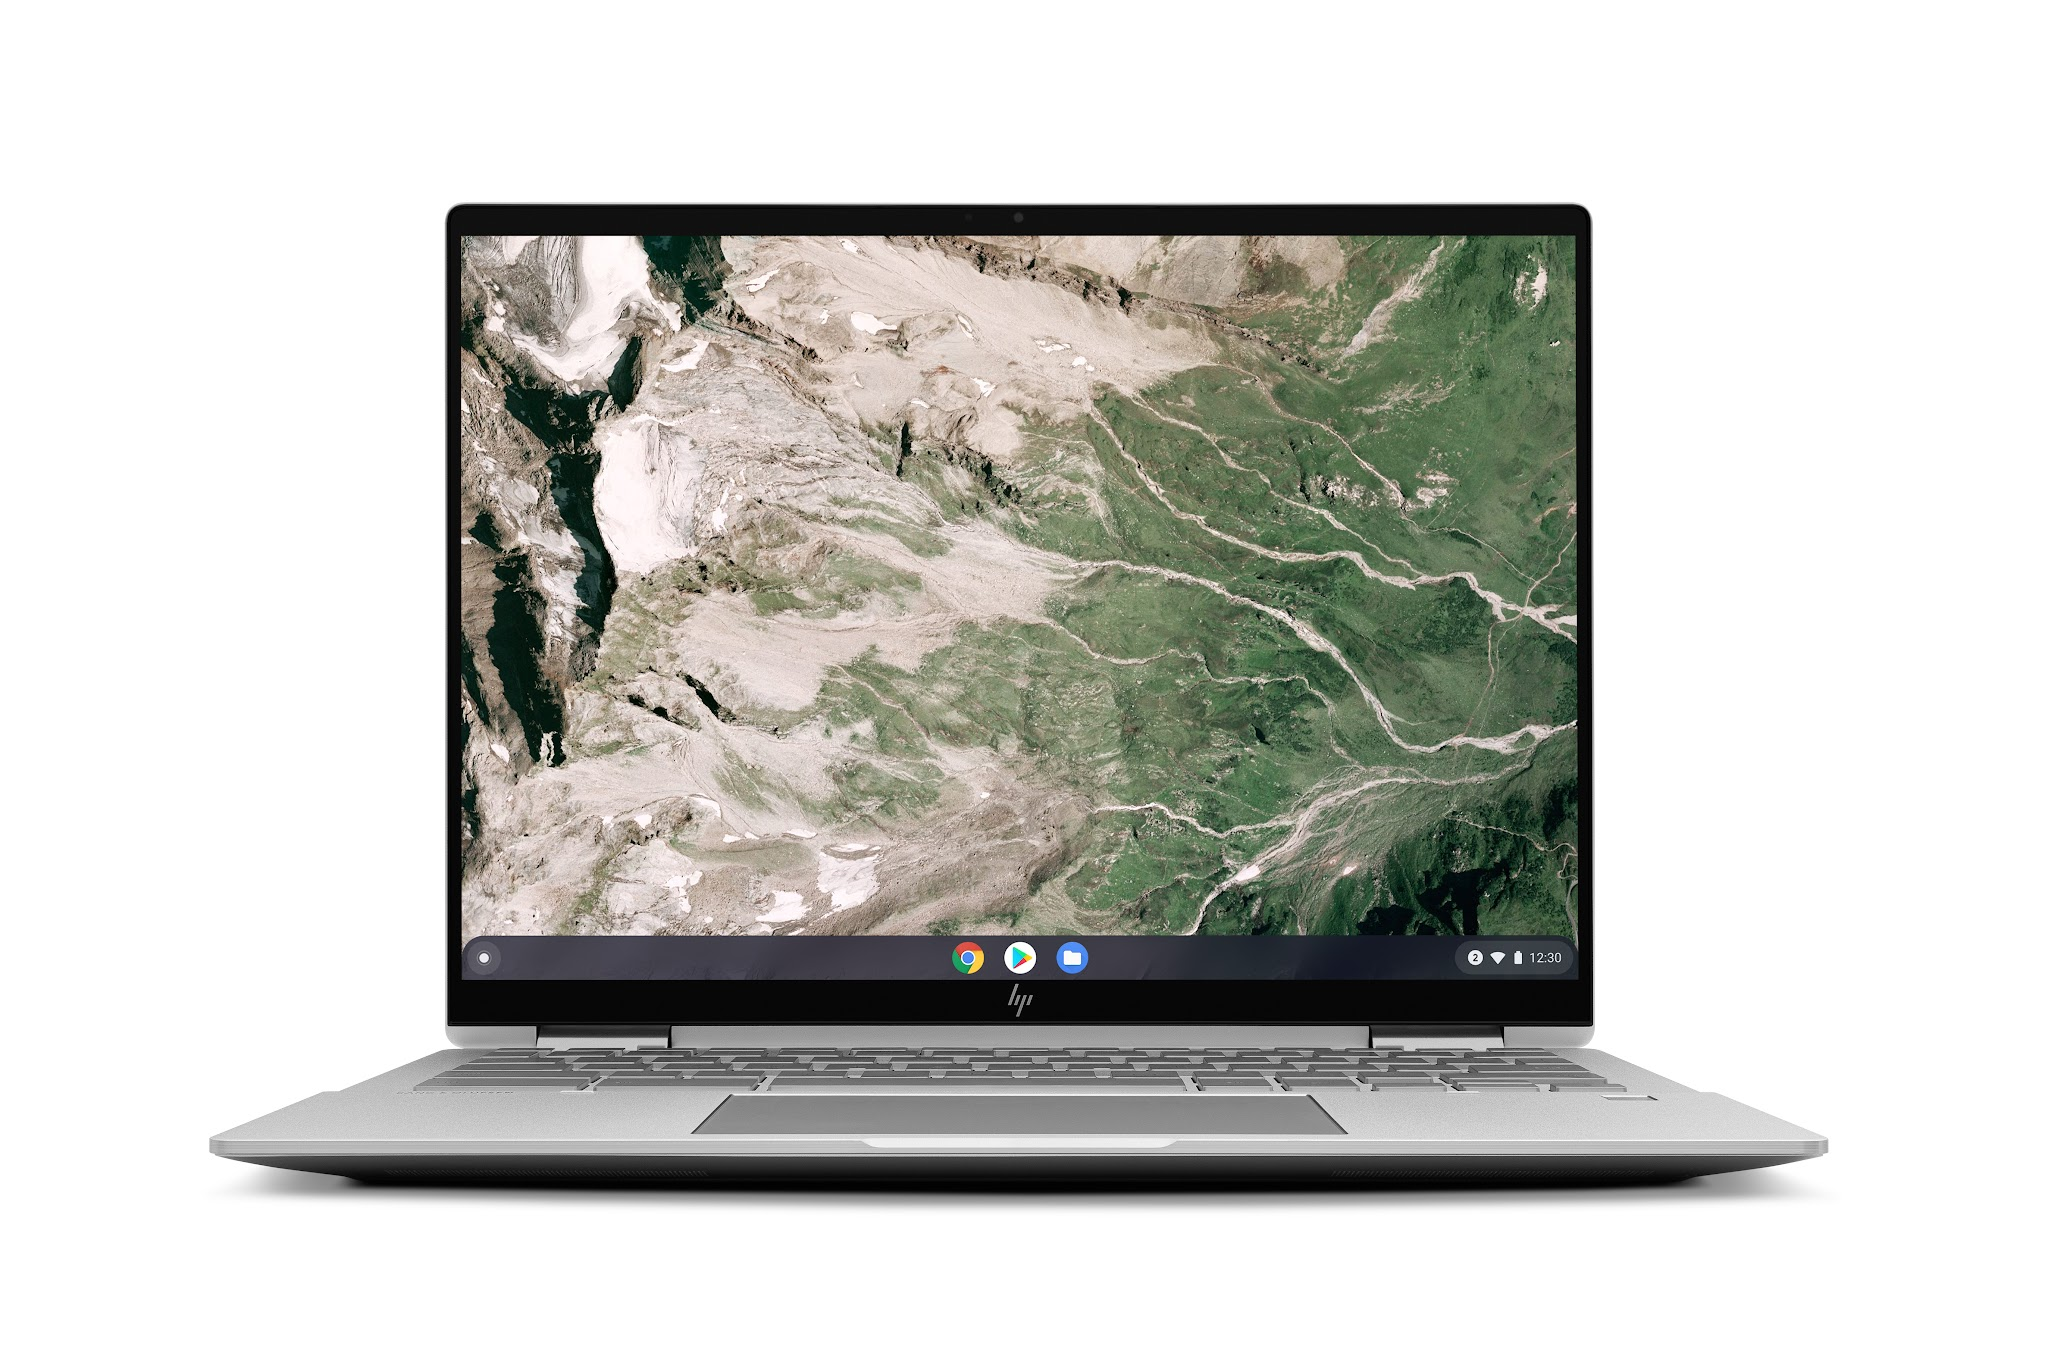 HP Chromebook x360 13c - photo 1